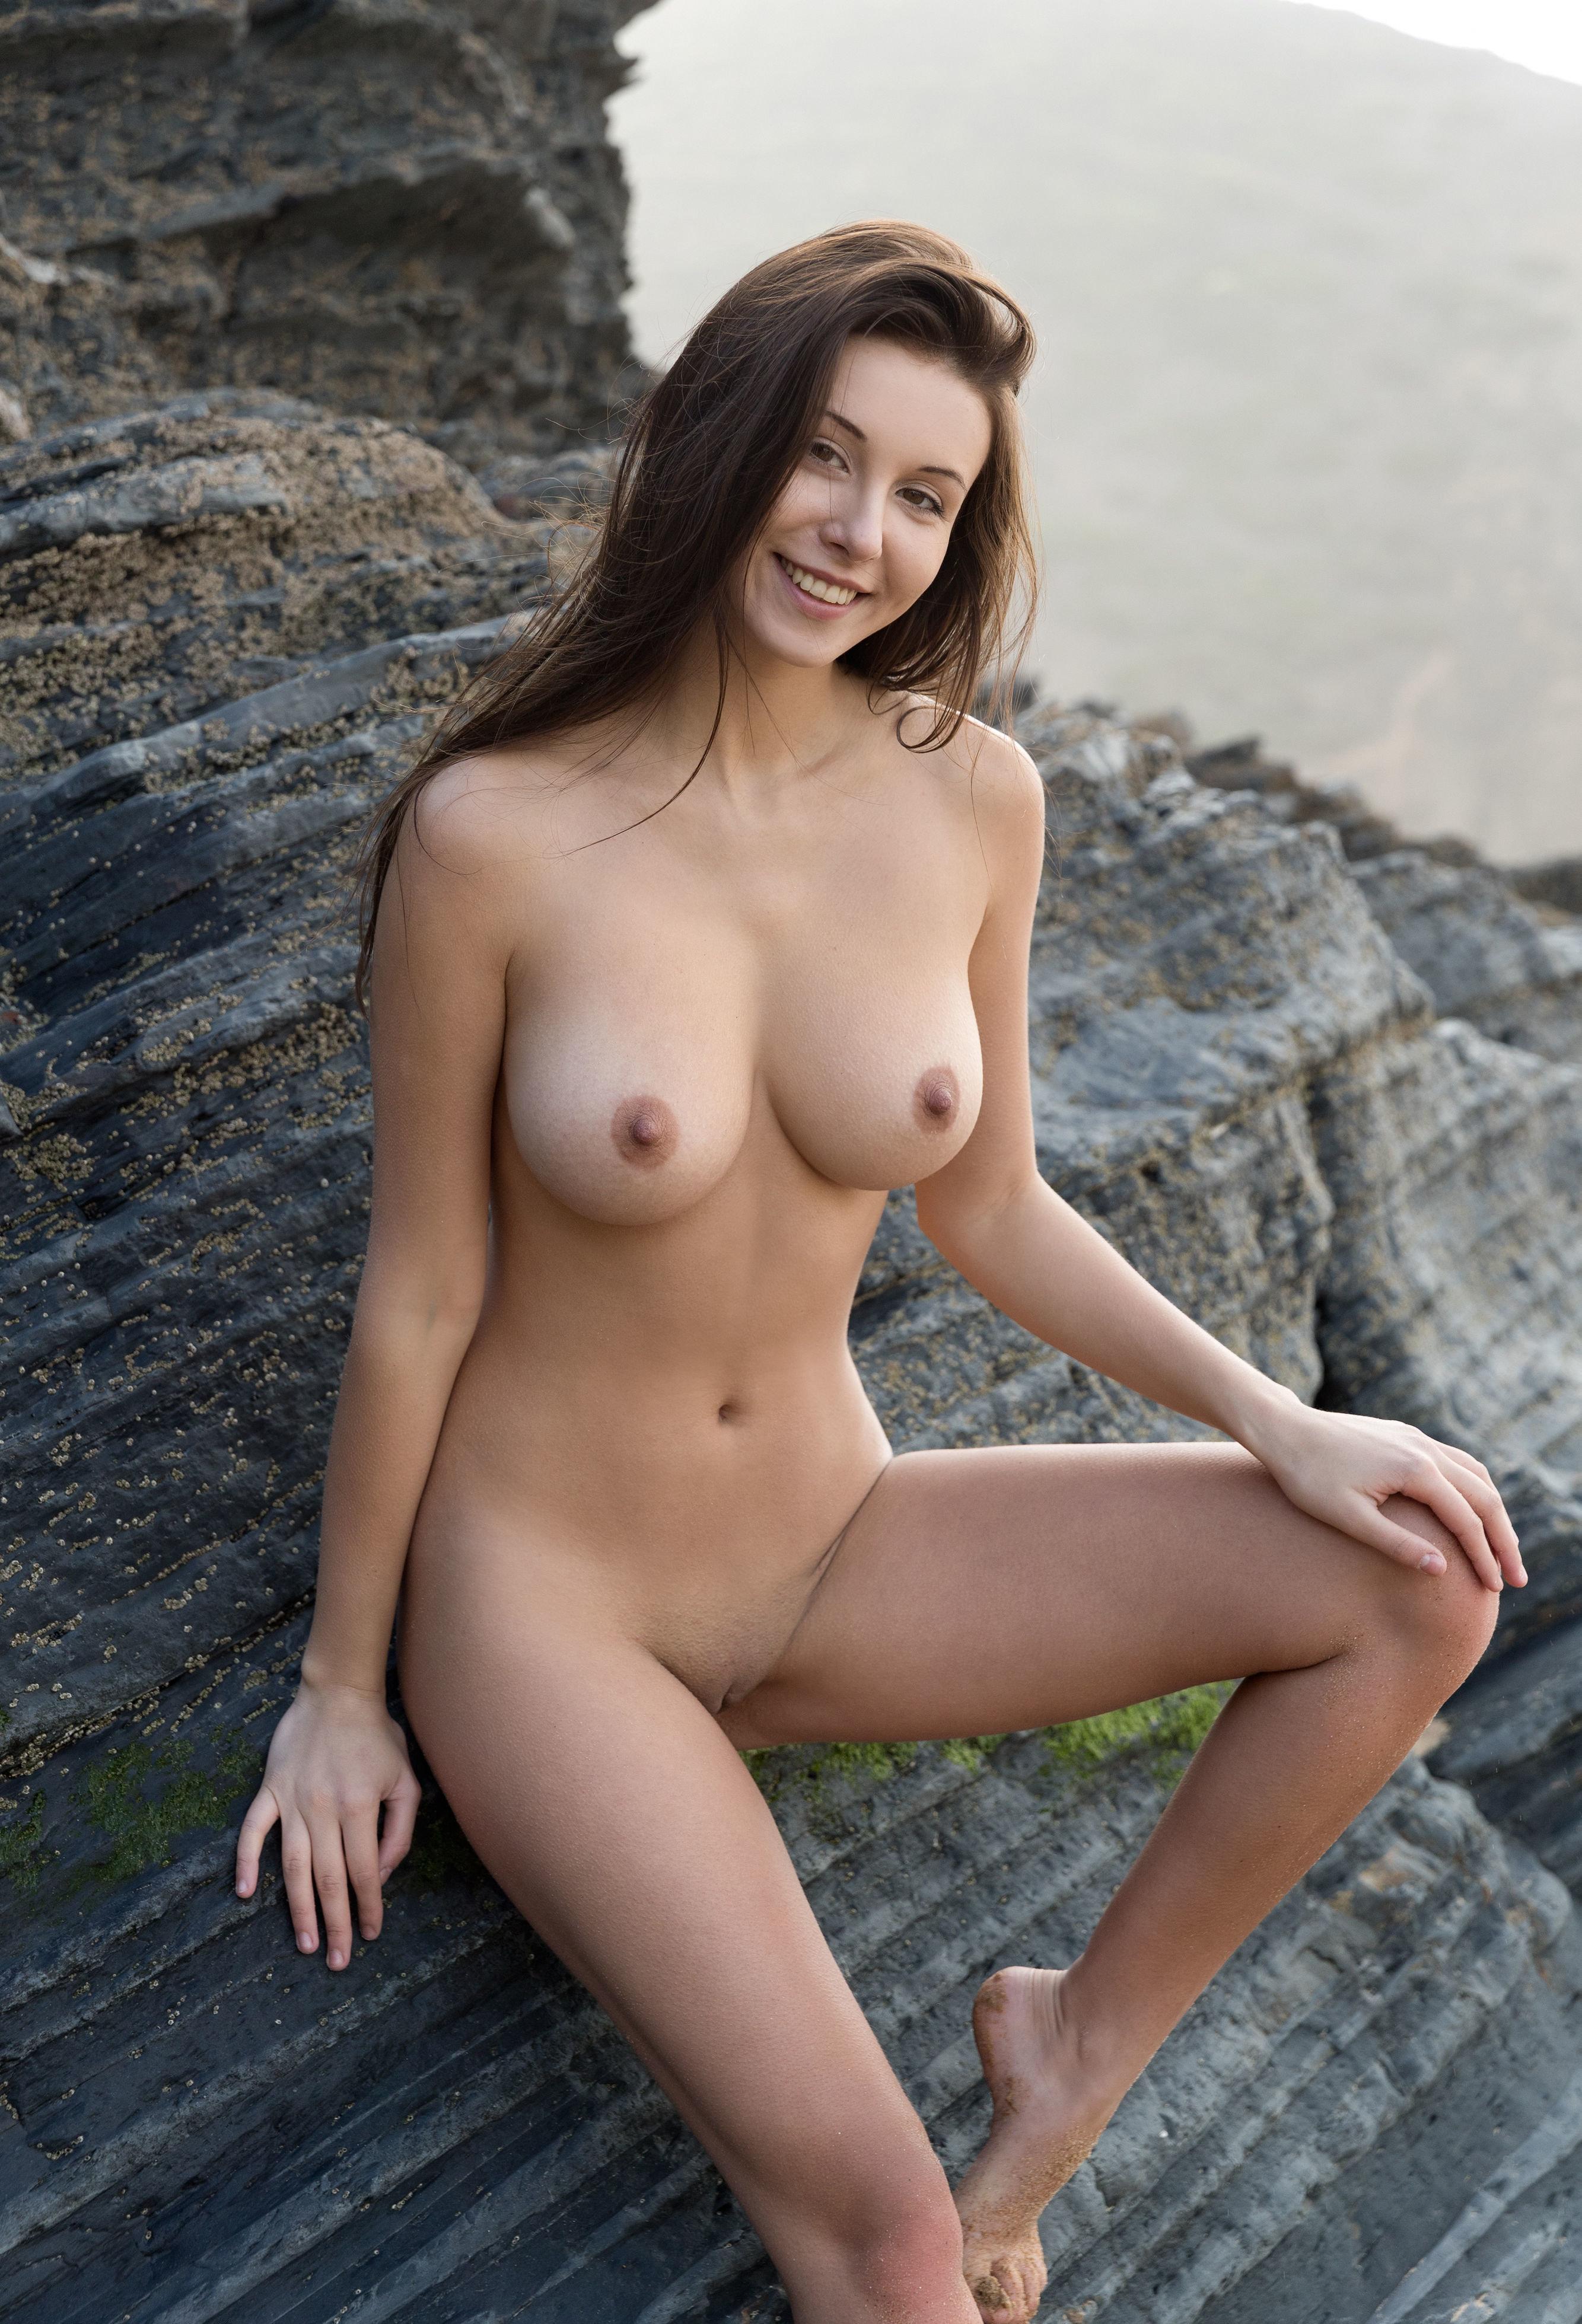 Alisa Sex Video alisa i. porn pic - eporner